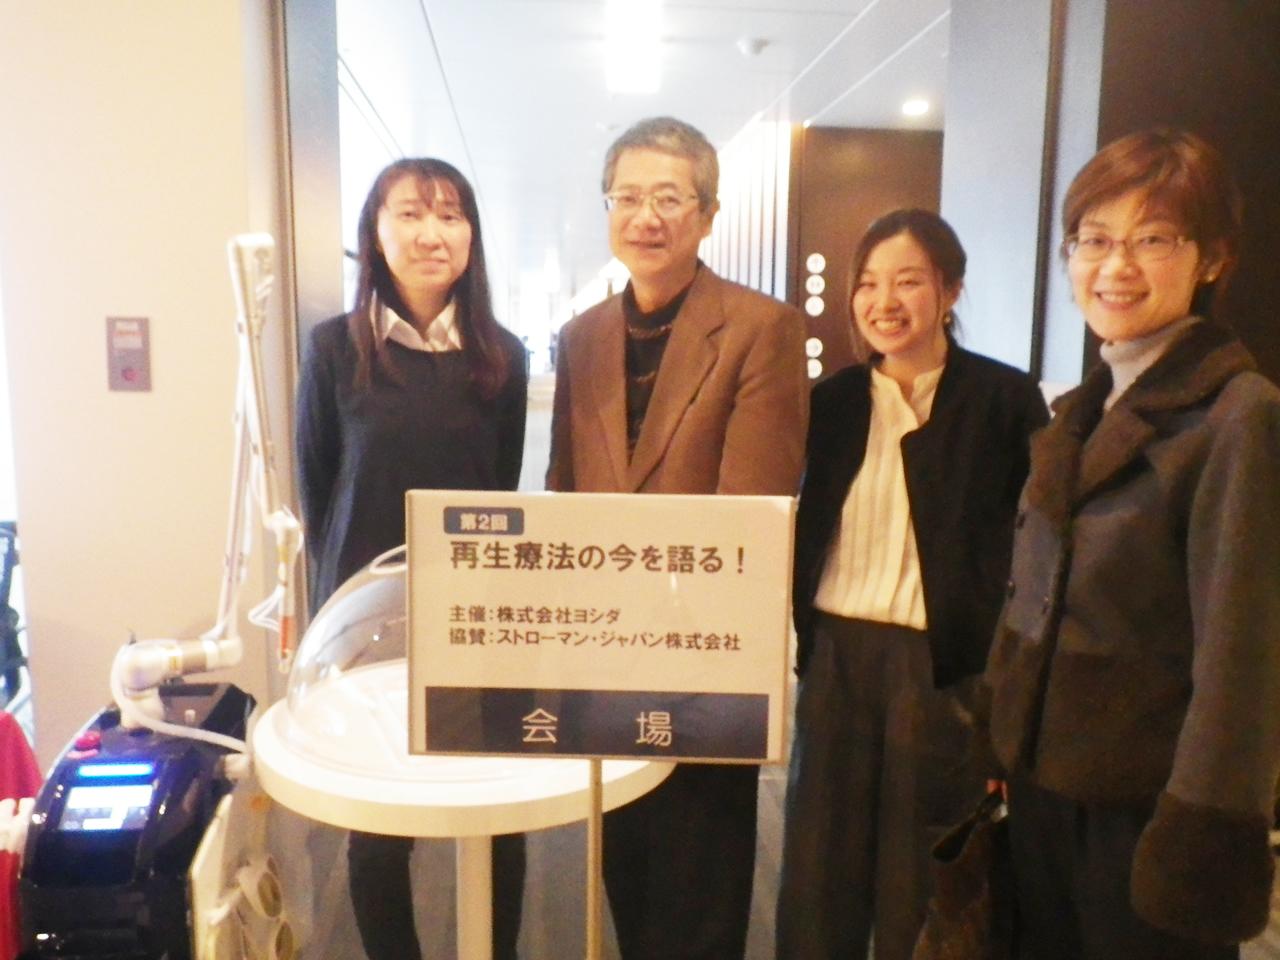 H28.11.3 東京にて 再生医療法の今を語る